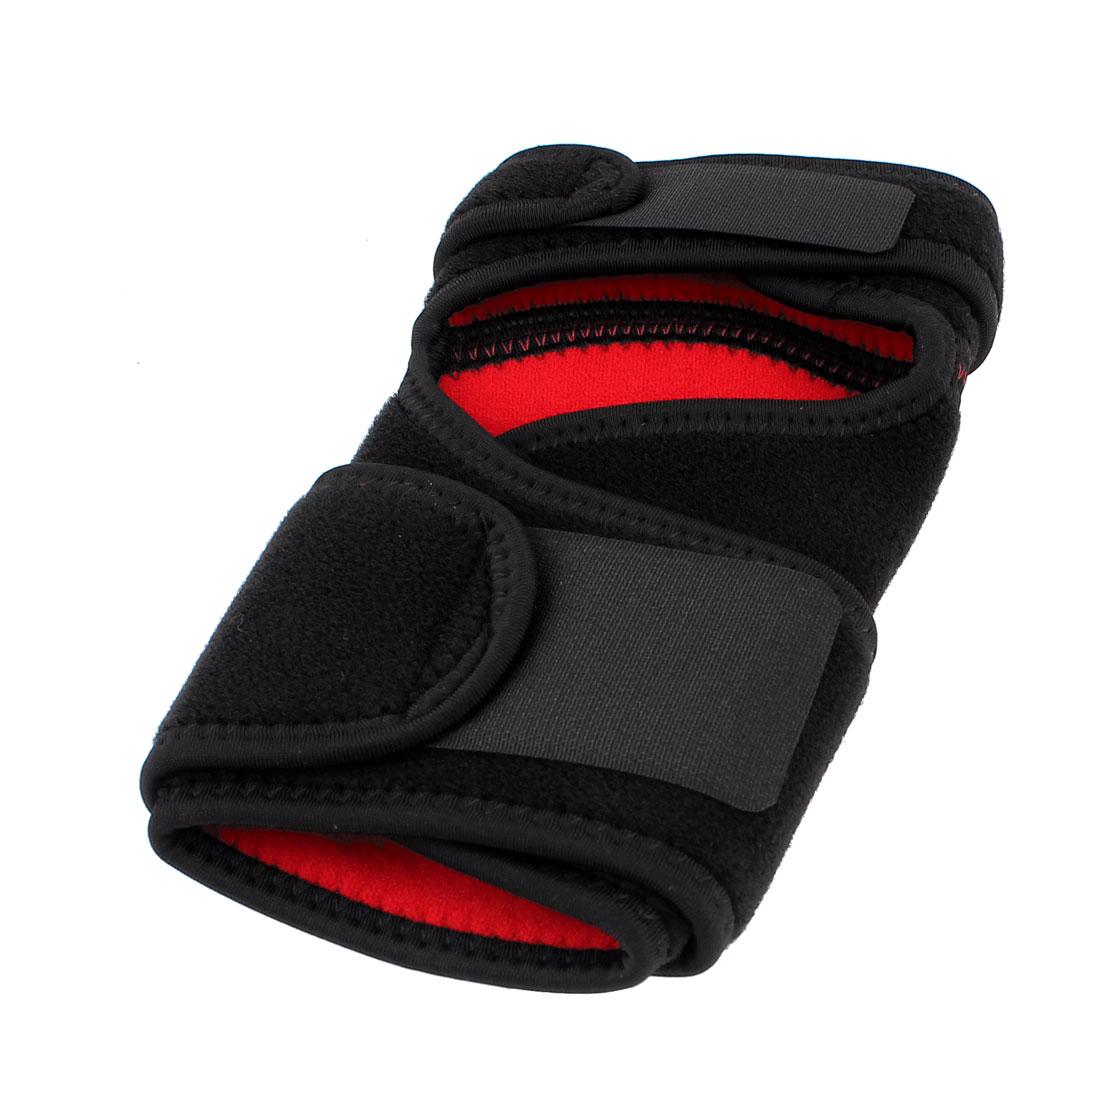 Fitness Sports Gym Workout Sport Adjustable Knee Support Brace Guard Black